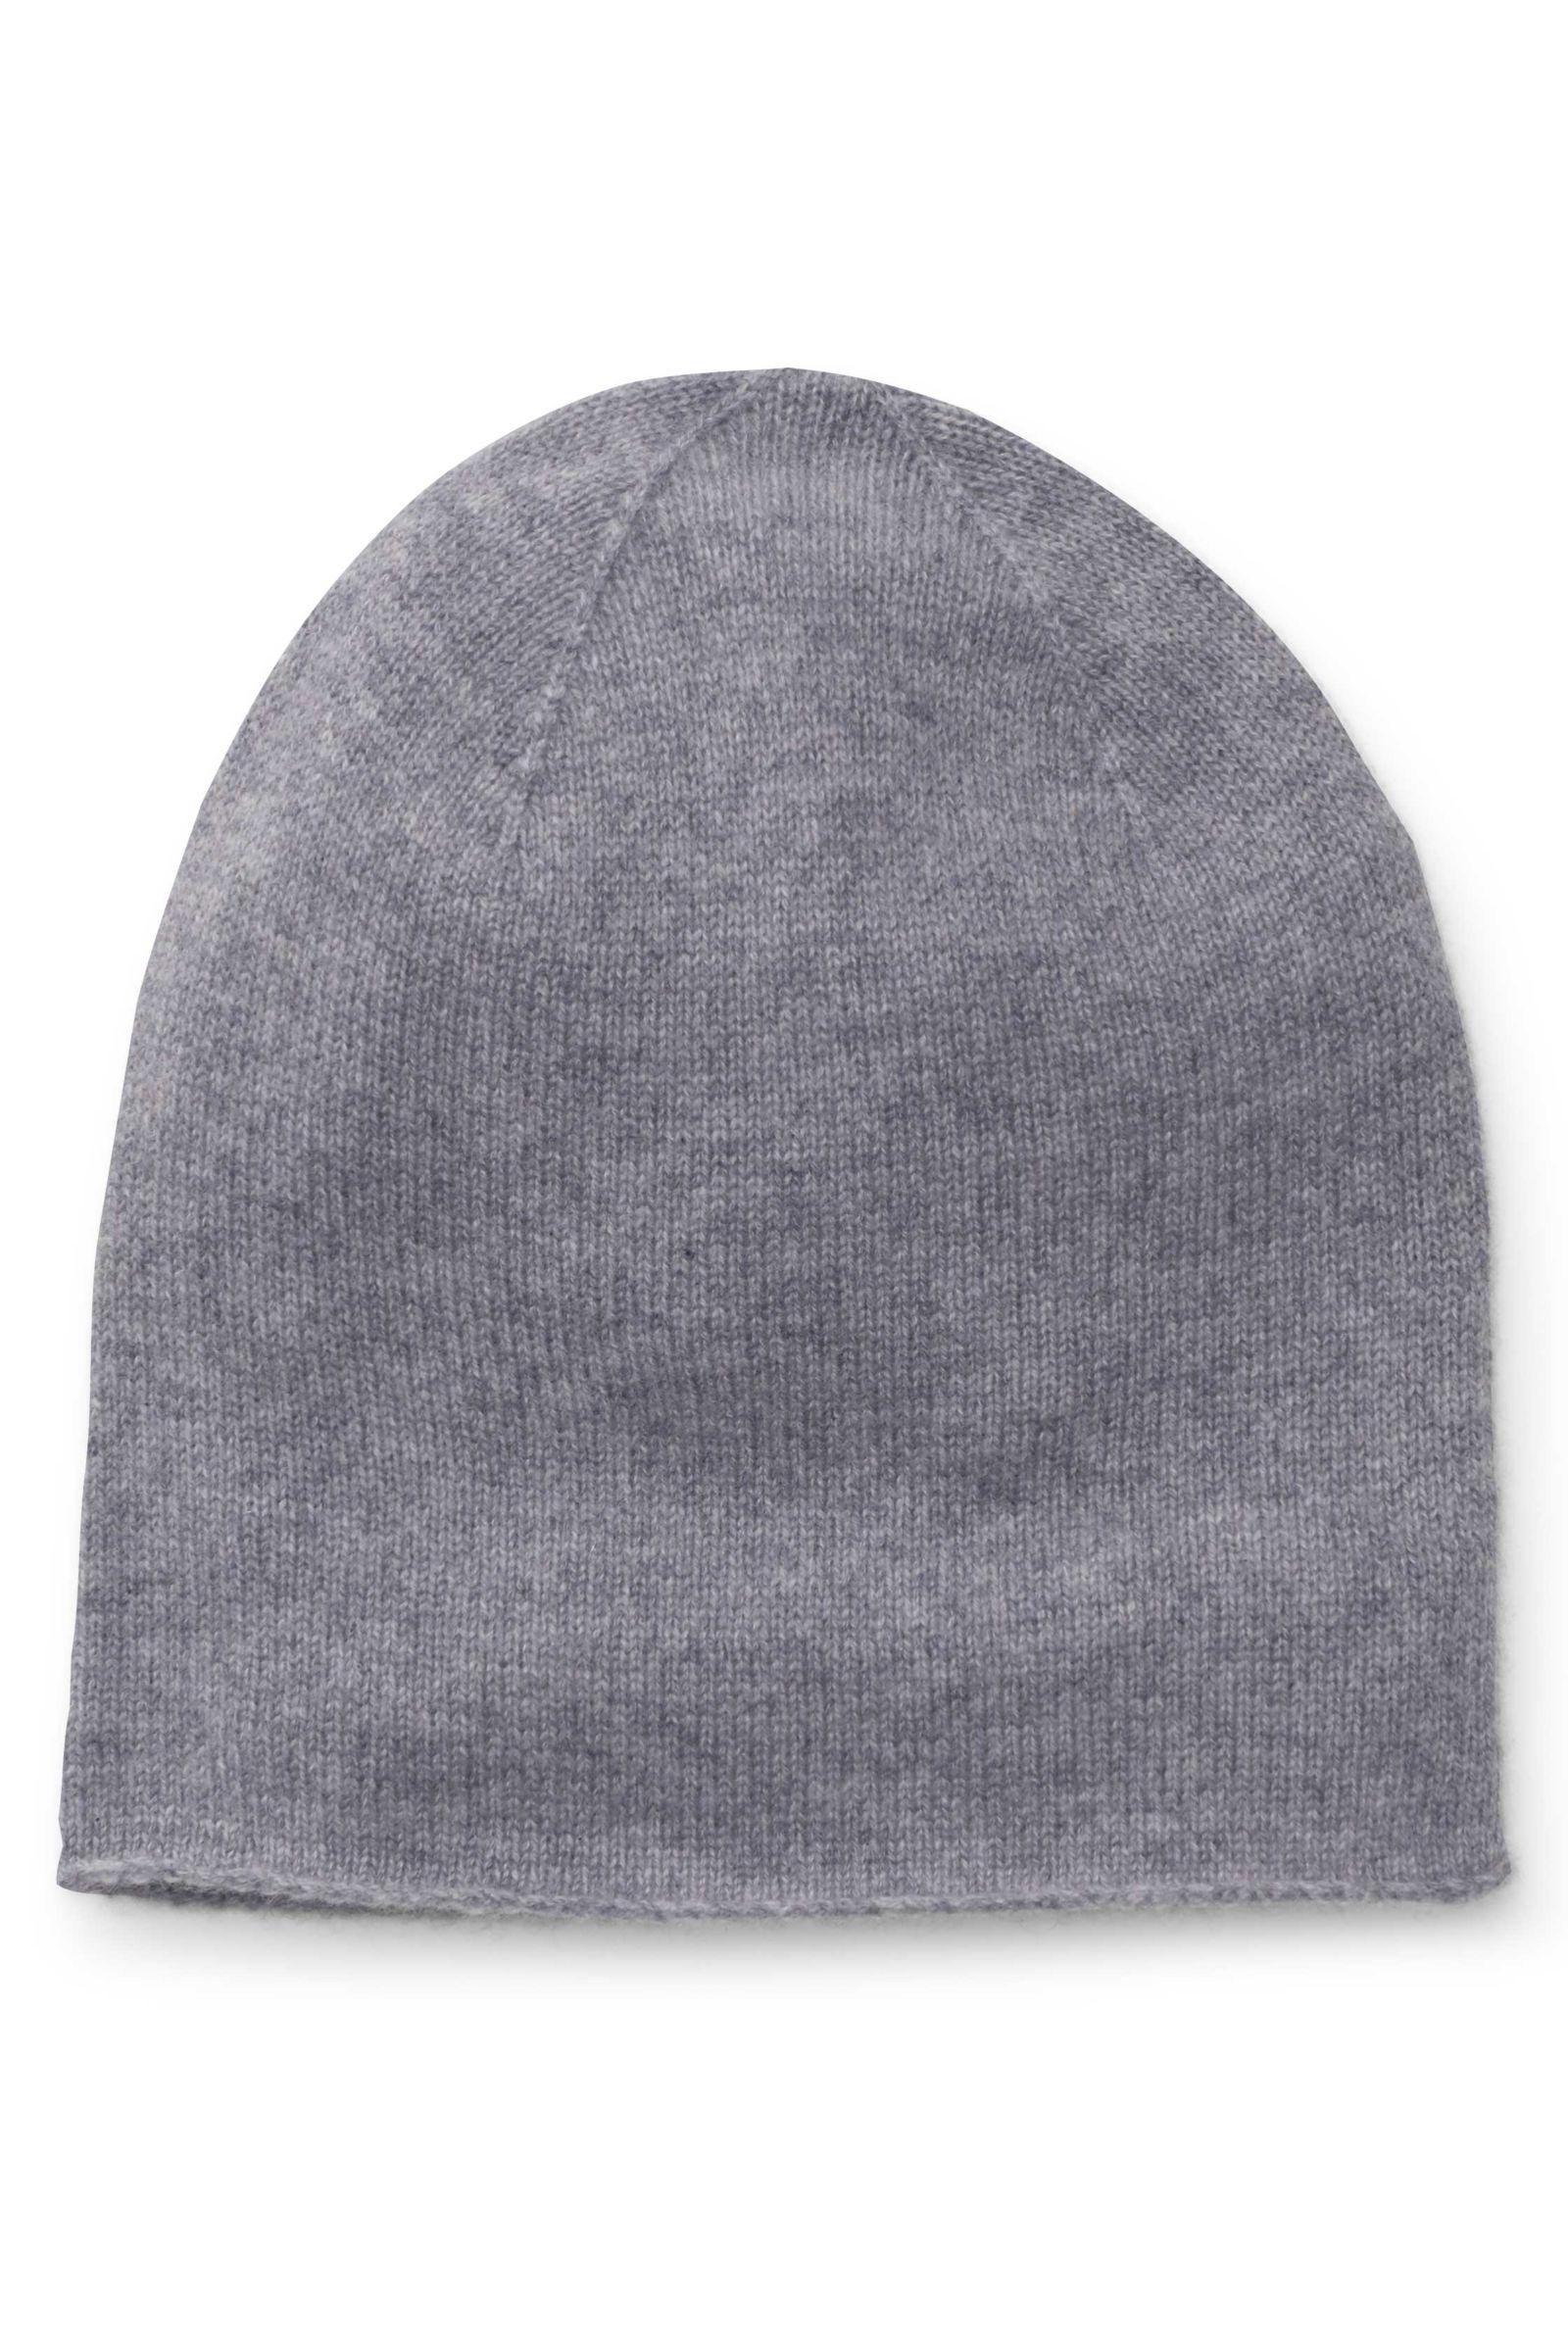 Cashmere beanie grey